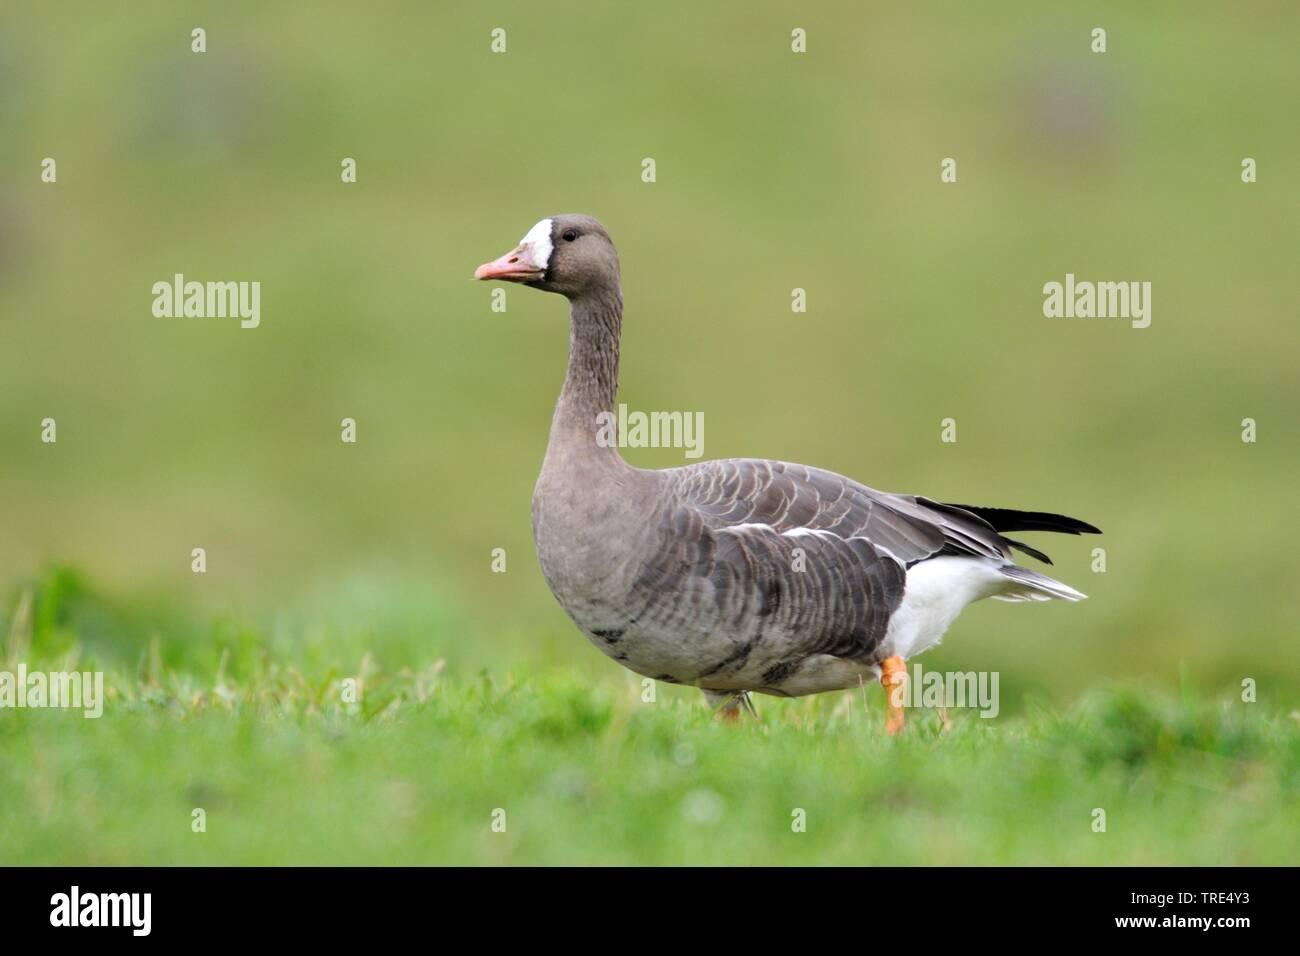 Blaessgans, Blaess-Gans, Blessgans, Bless-Gans (Anser albifrons), auf der Wiese, Deutschland, NRW | white-fronted goose (Anser albifrons), on the mead - Stock Image